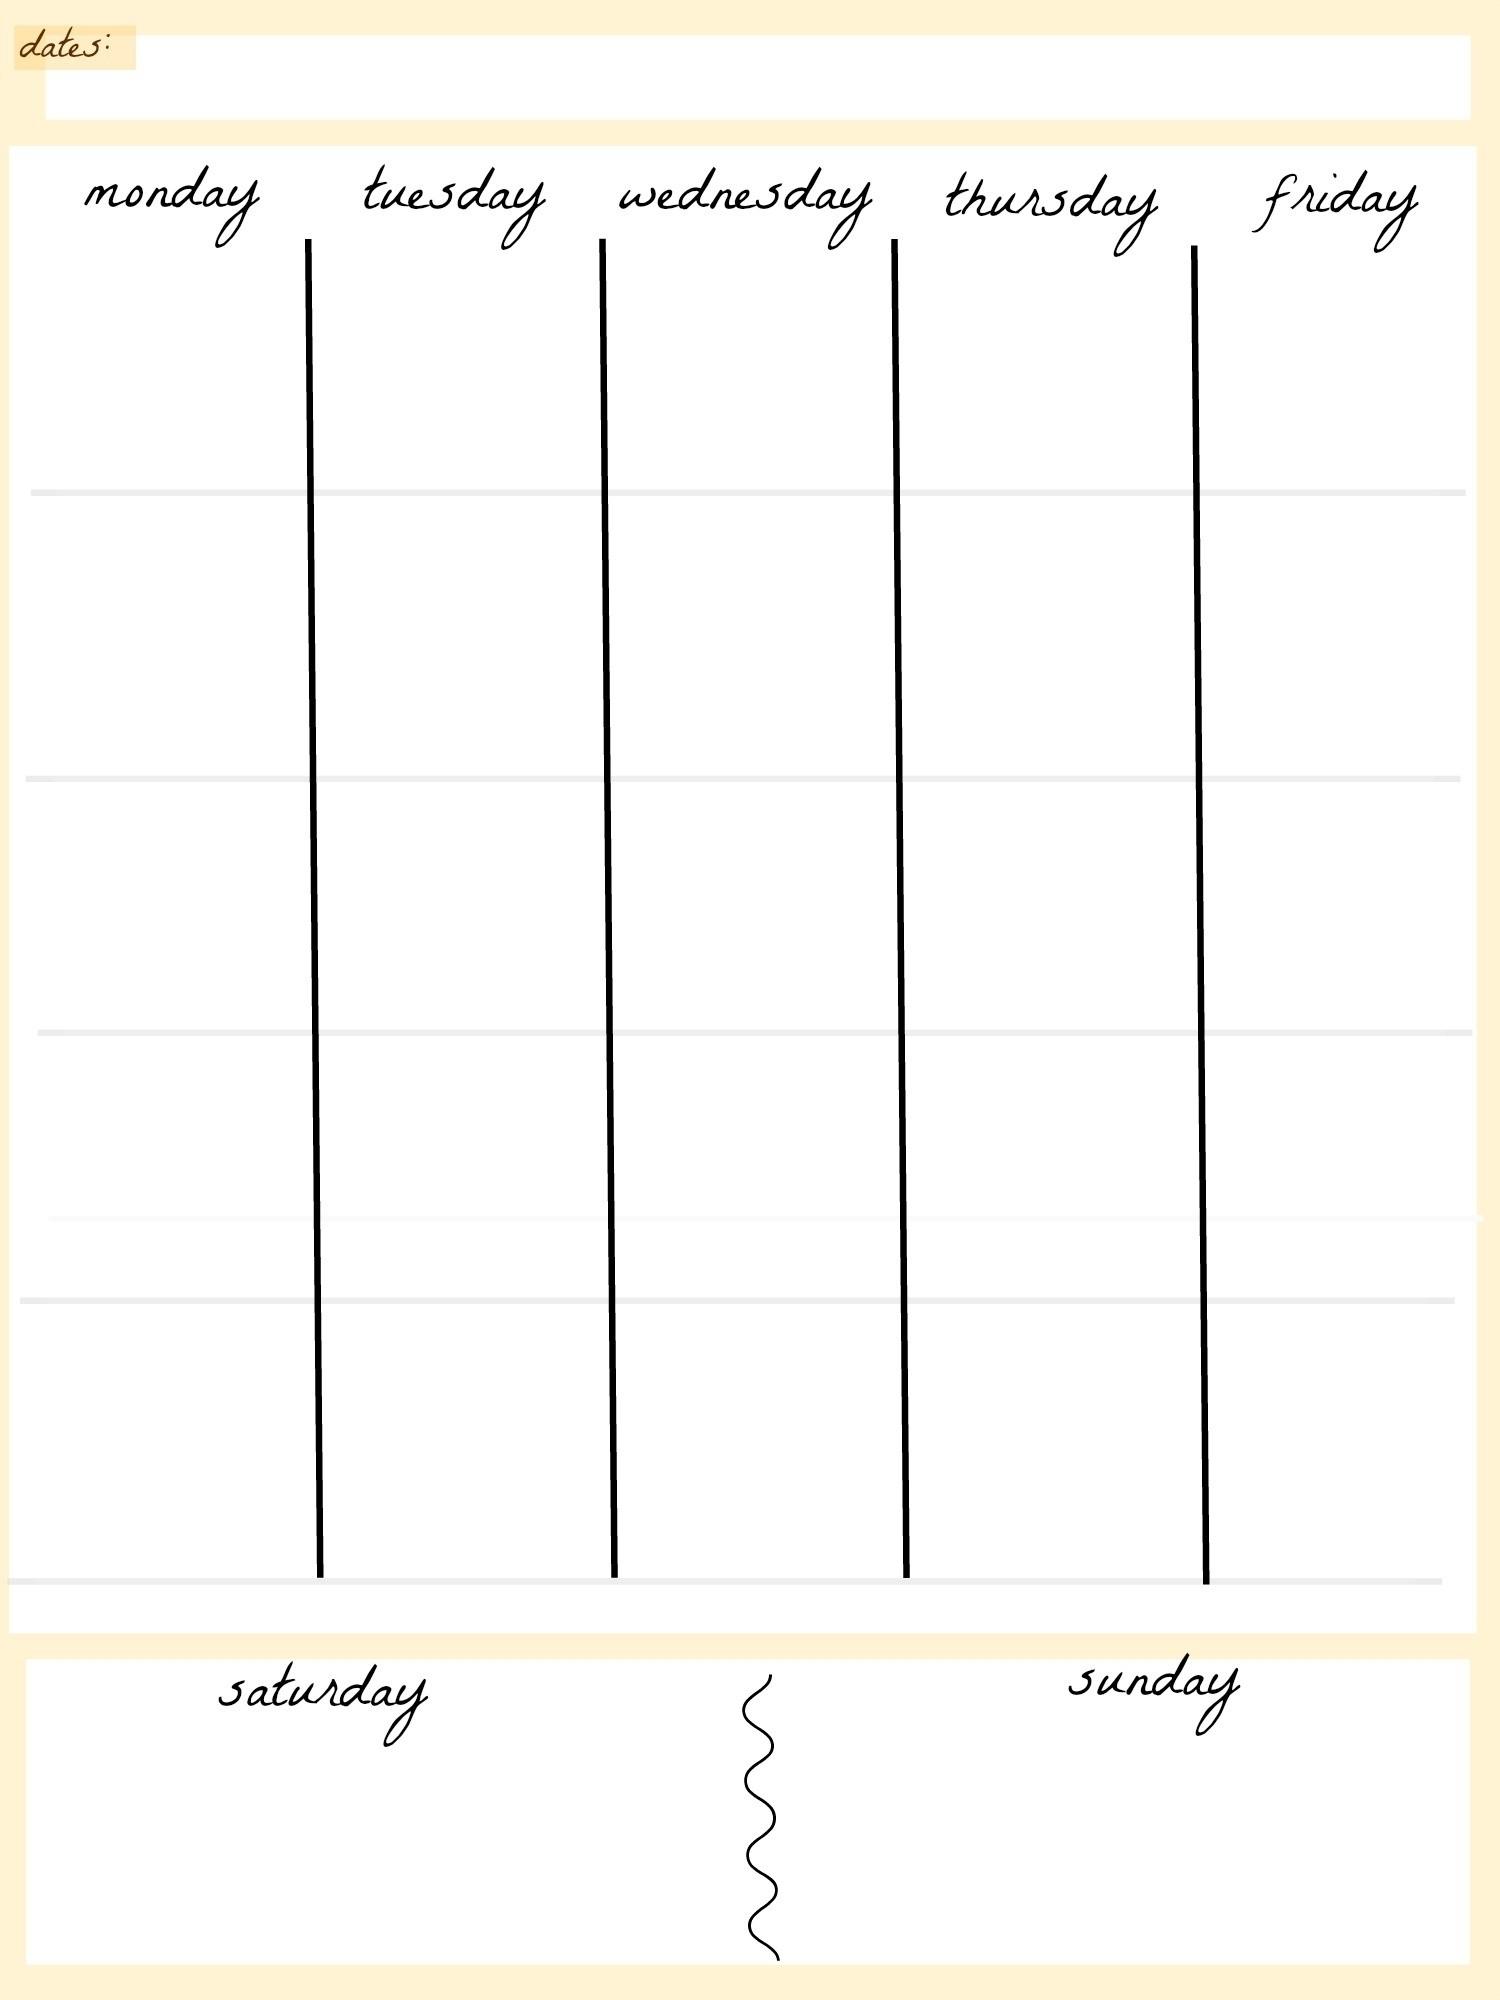 Free Printable 5 Day Calendar | Template Calendar Printable throughout 5 Day Calendar Printable Free